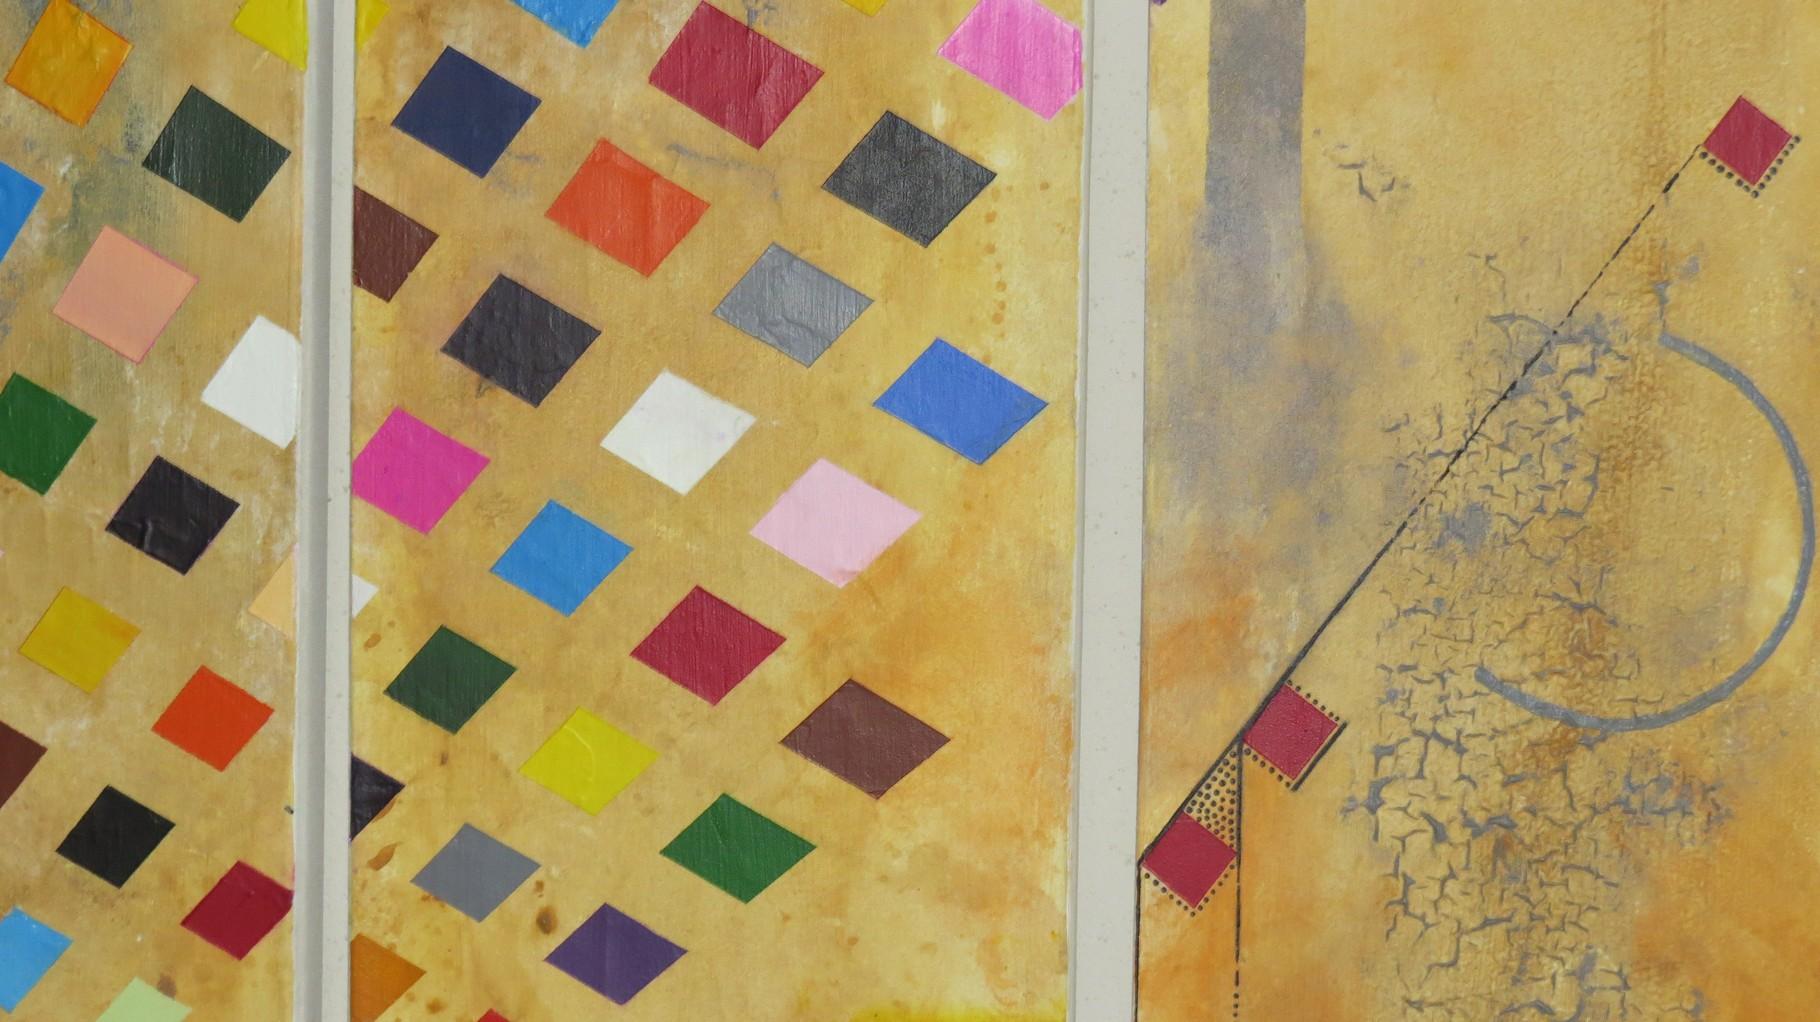 circuit imprimé zoom3 - daluz galego tableau abstrait abstraction